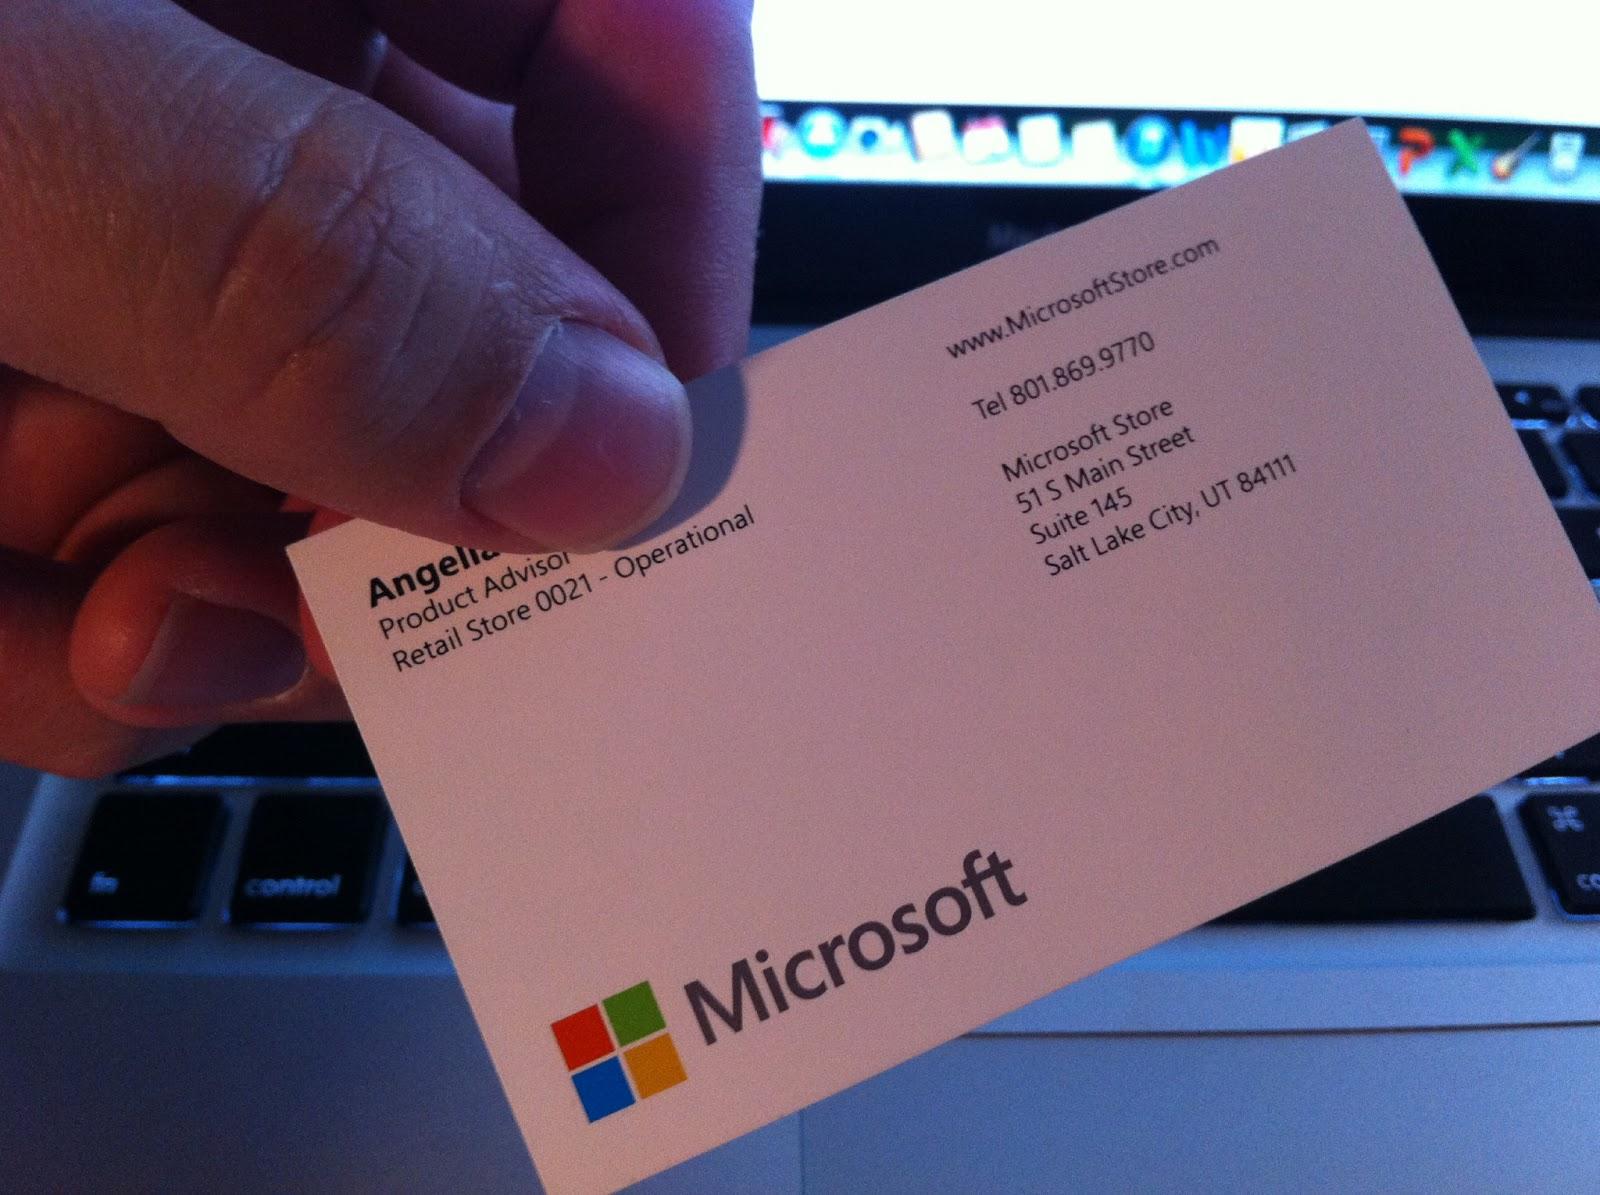 Angella Gave Me Her Business Card Matt Scanned My